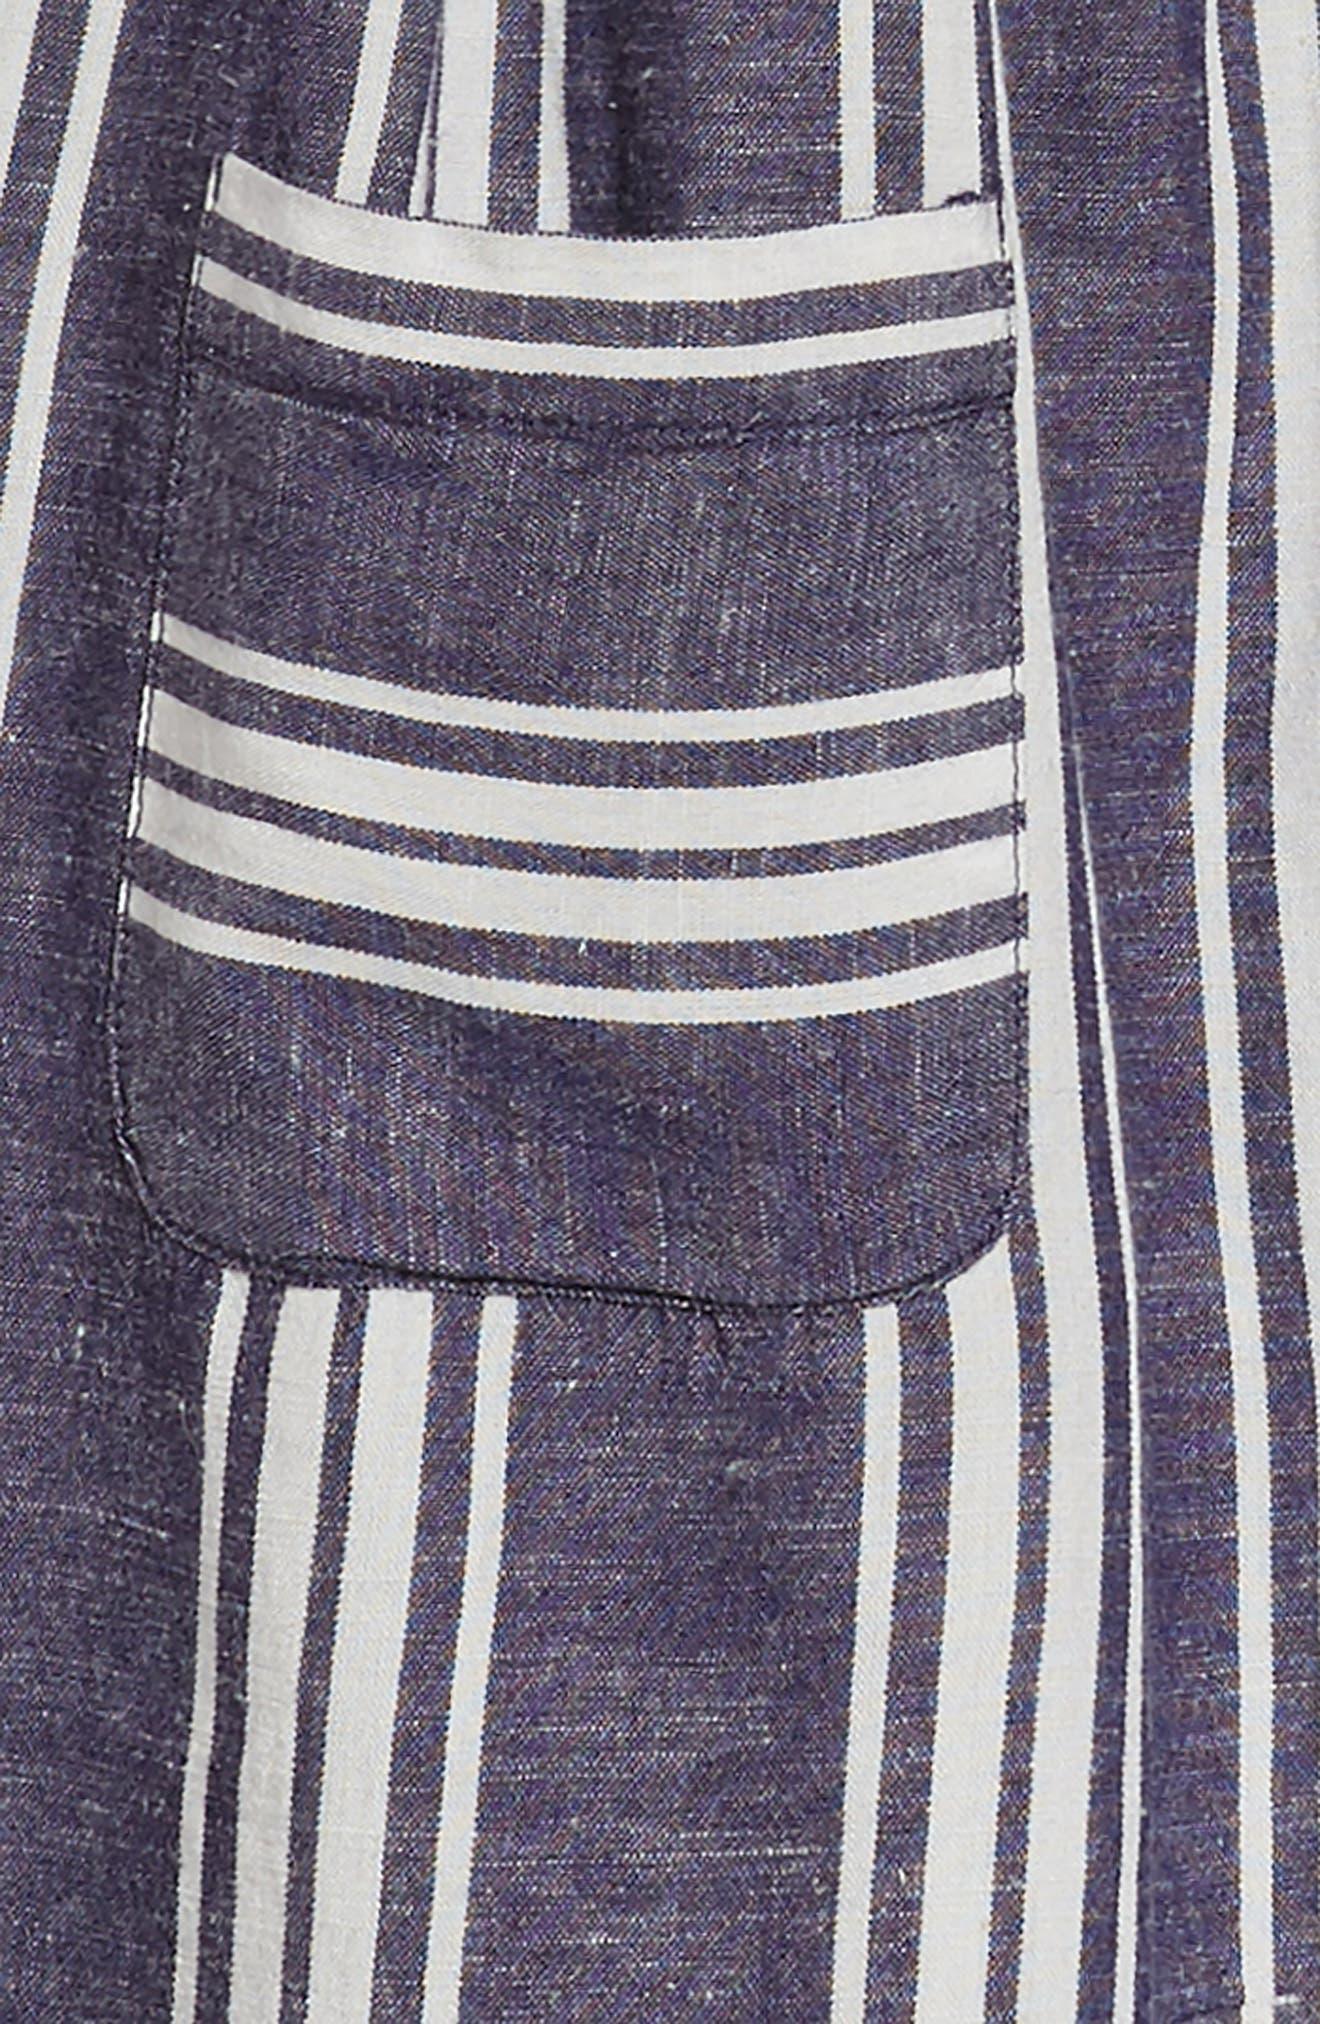 Alternate Image 3  - Tucker + Tate Stripe Fit & Flare Dress (Toddler Girls, Little Girls & Big Girls)